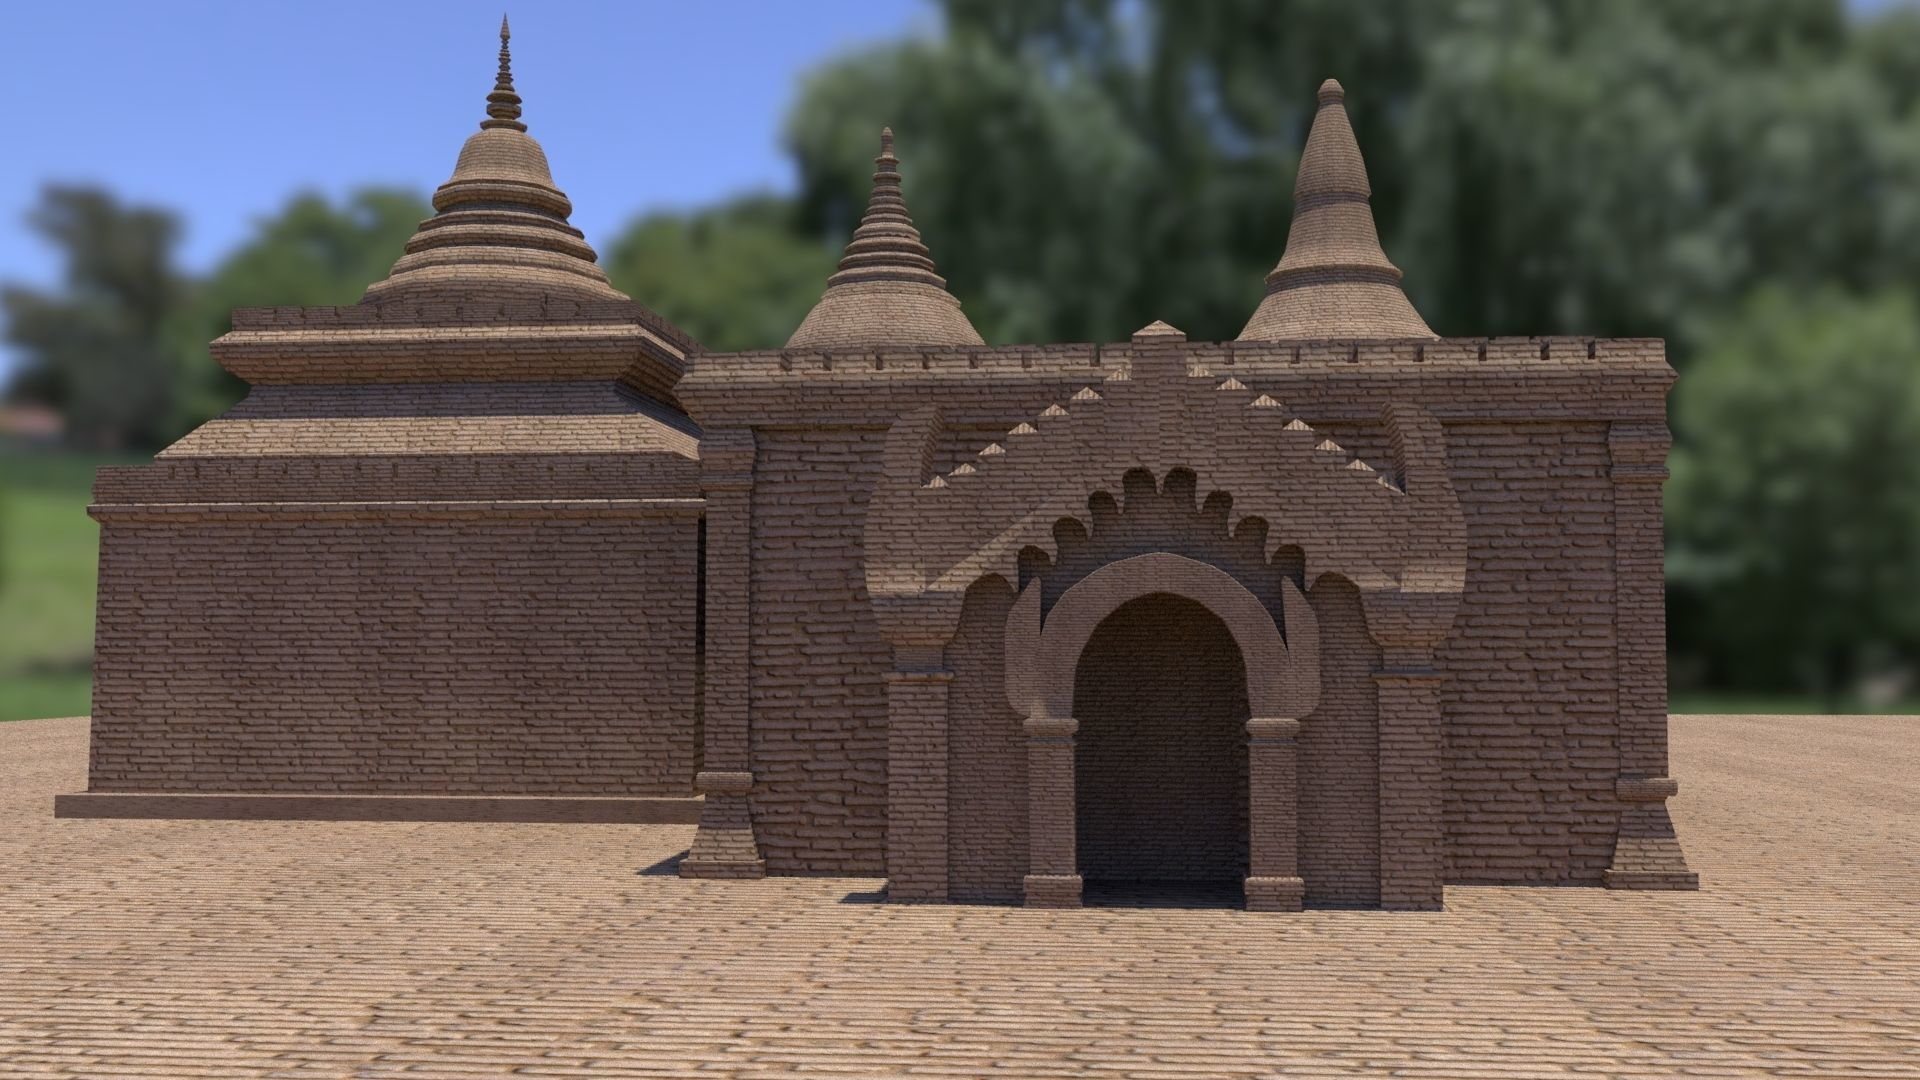 Bagan Budha temple